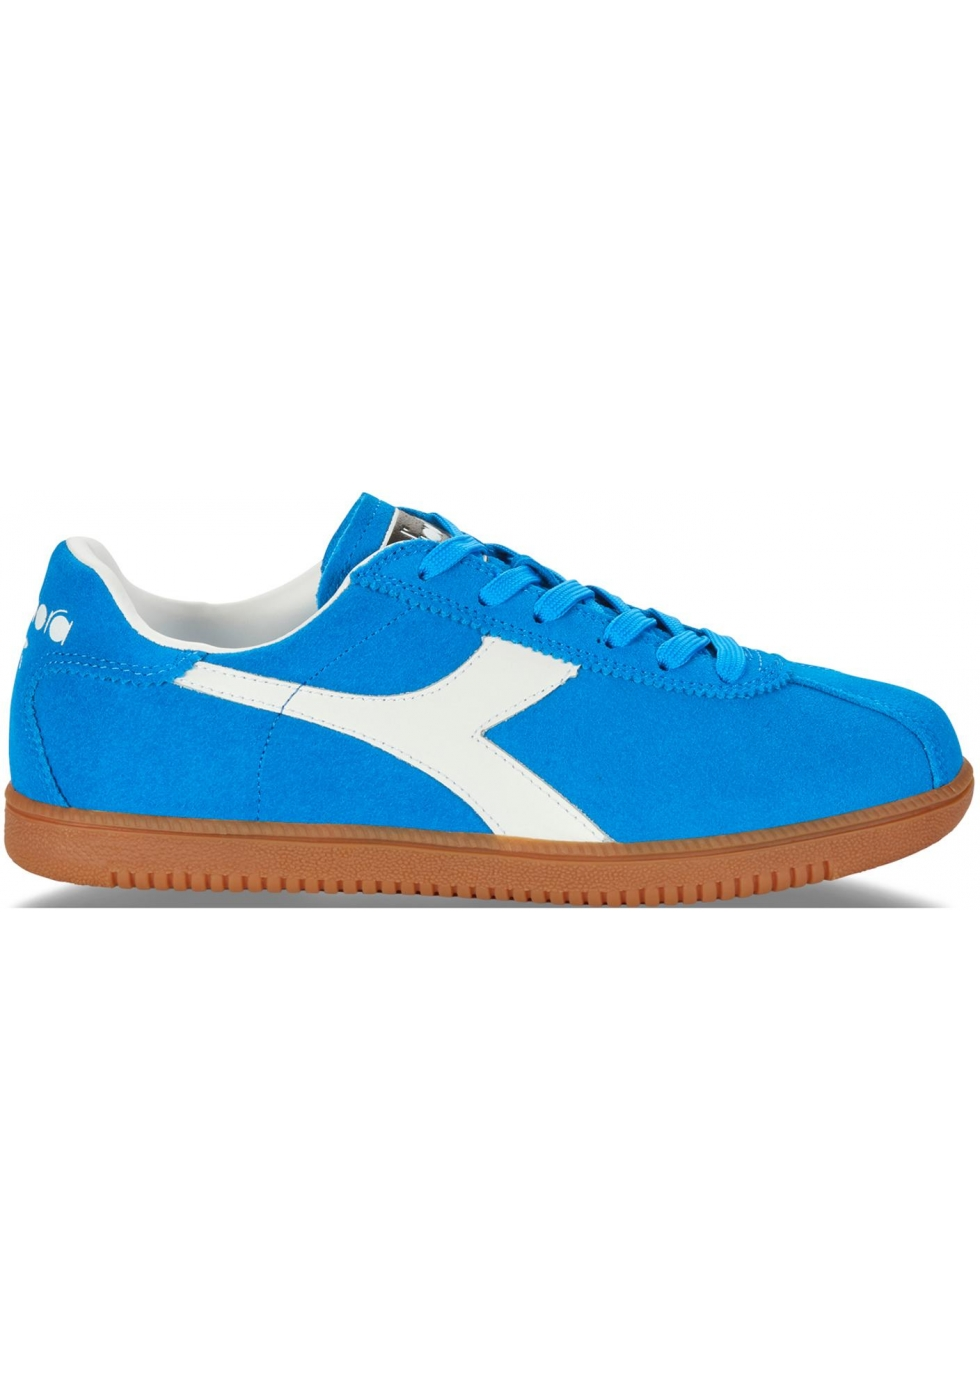 Diadora Men S Tokio Sneakers In Azure Suede Leather Italian Boutique